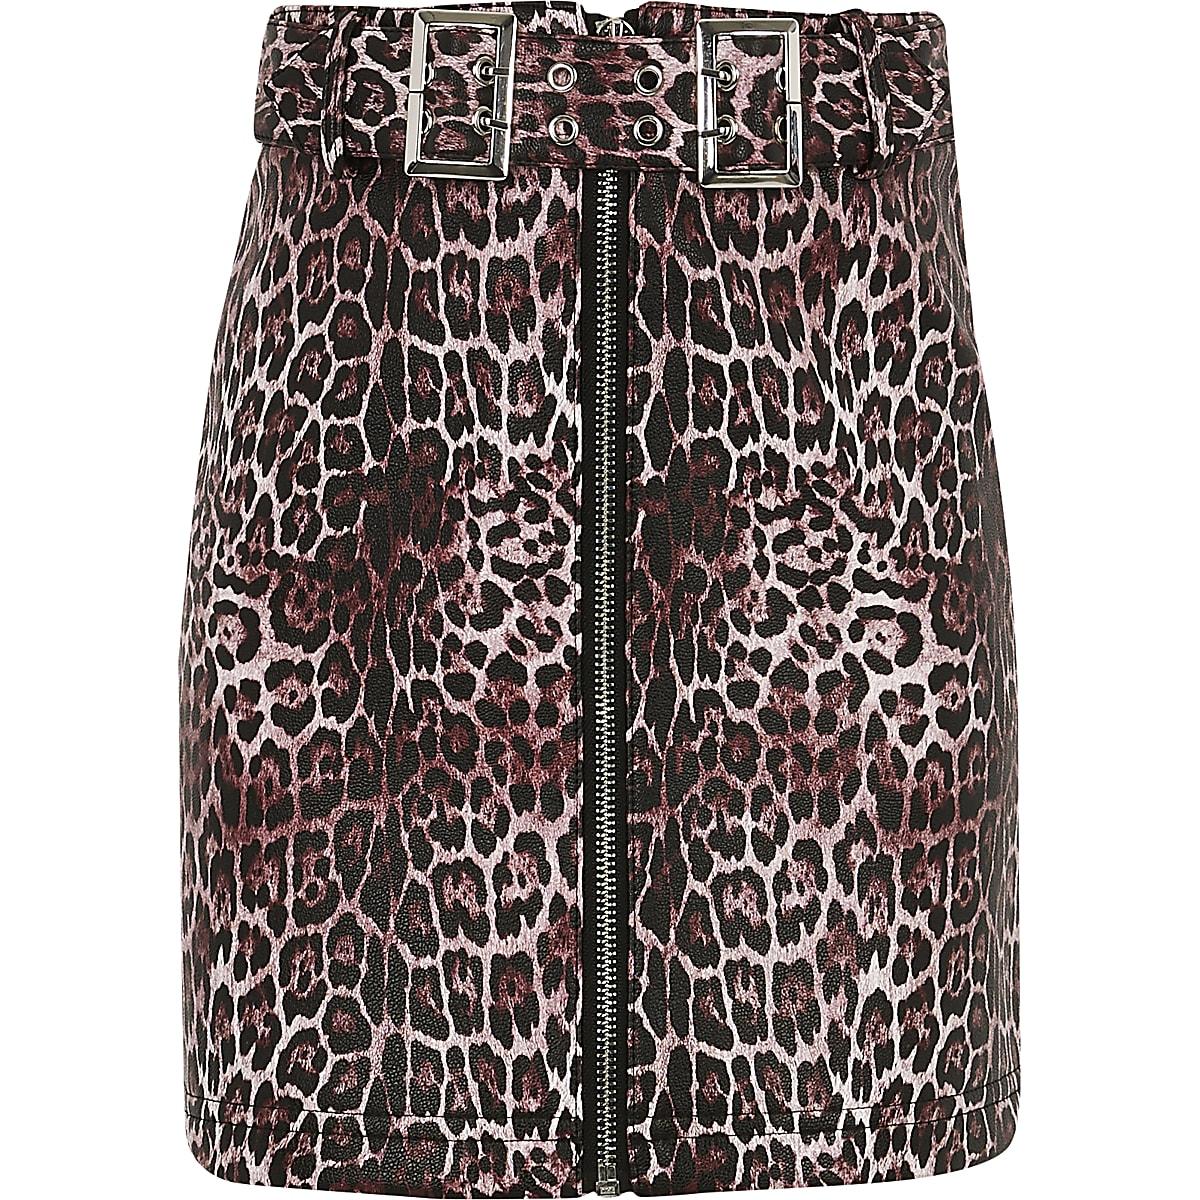 Girls leopard print belted skirt